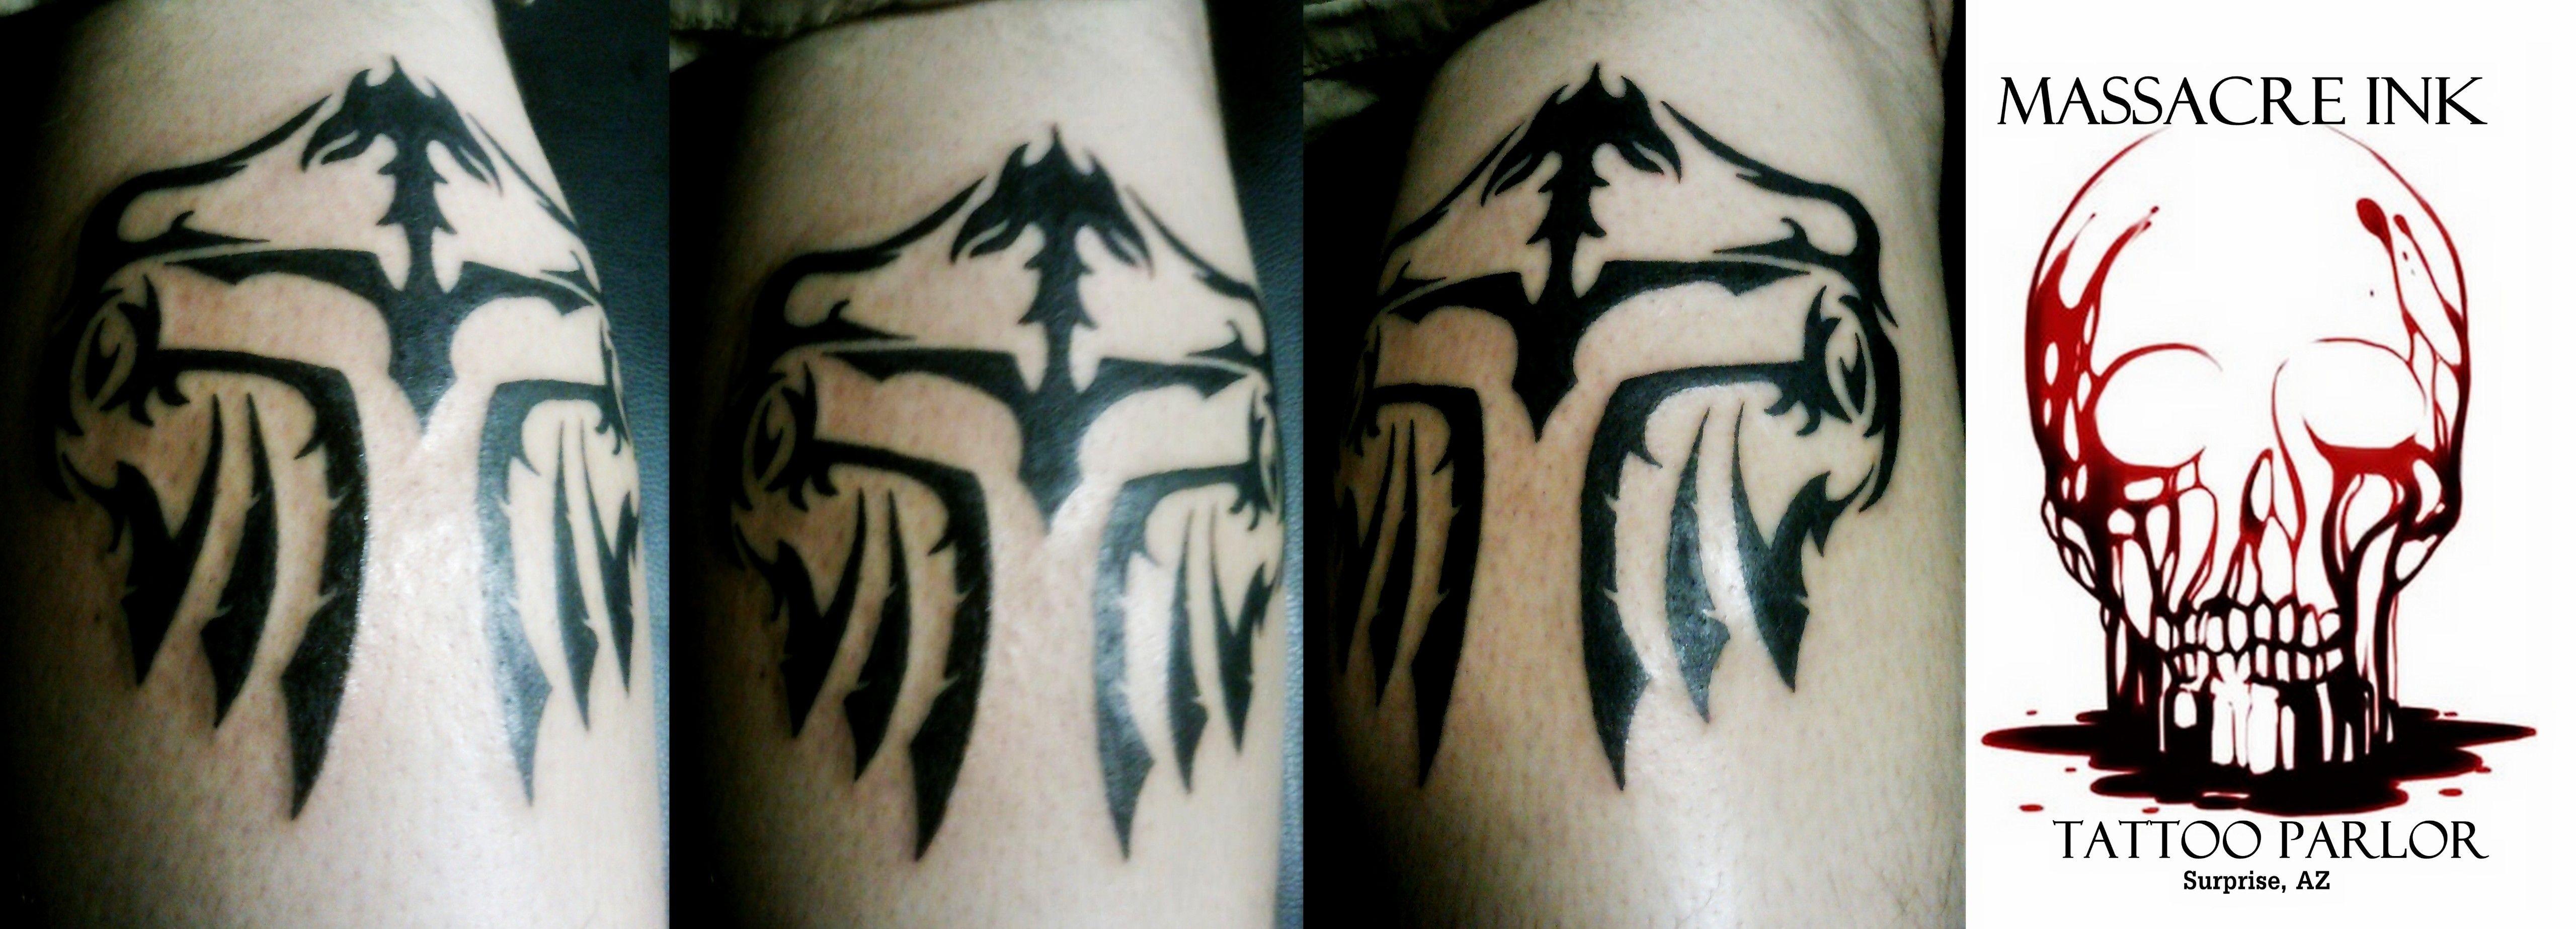 spartan tribal symbol for victory massacre ink tattoos